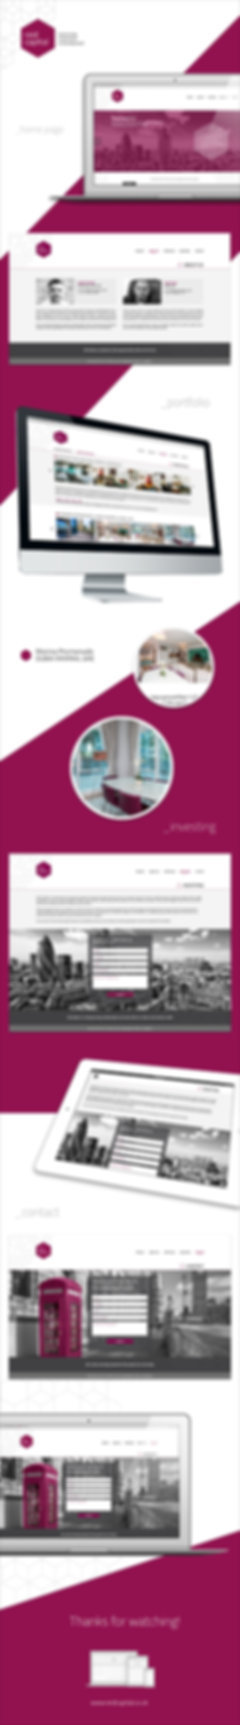 Reid Capiatl - Web design